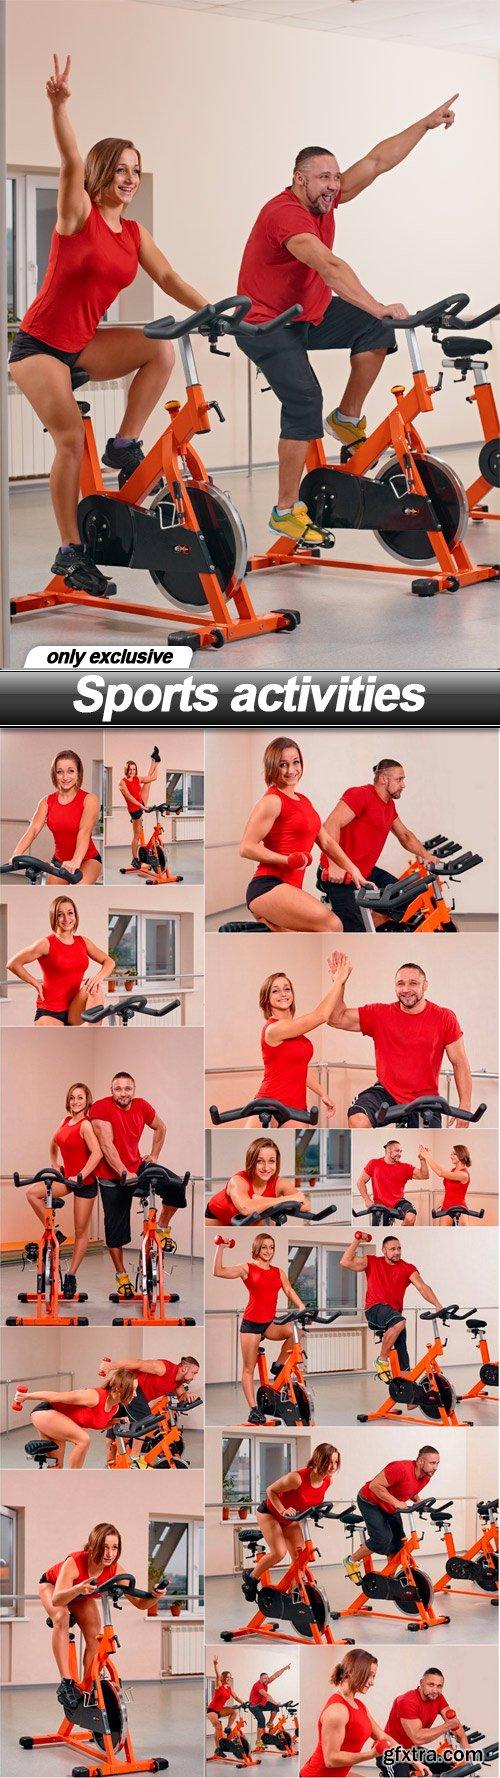 Sports activities - 14 UHQ JPEG